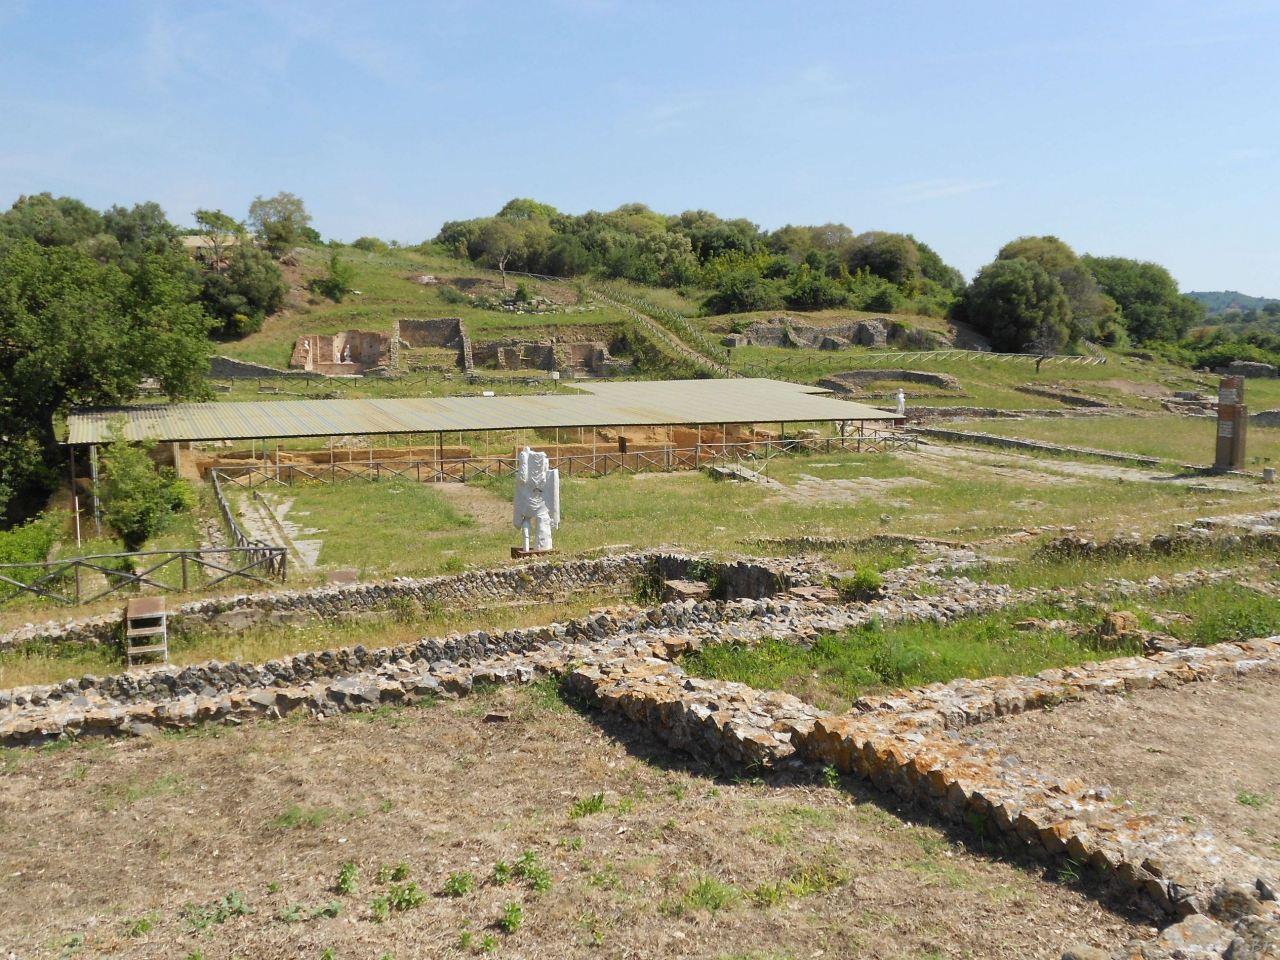 Roselle-Mura-Megalitiche-Roselle-Grosseto-Toscana-Italia-13